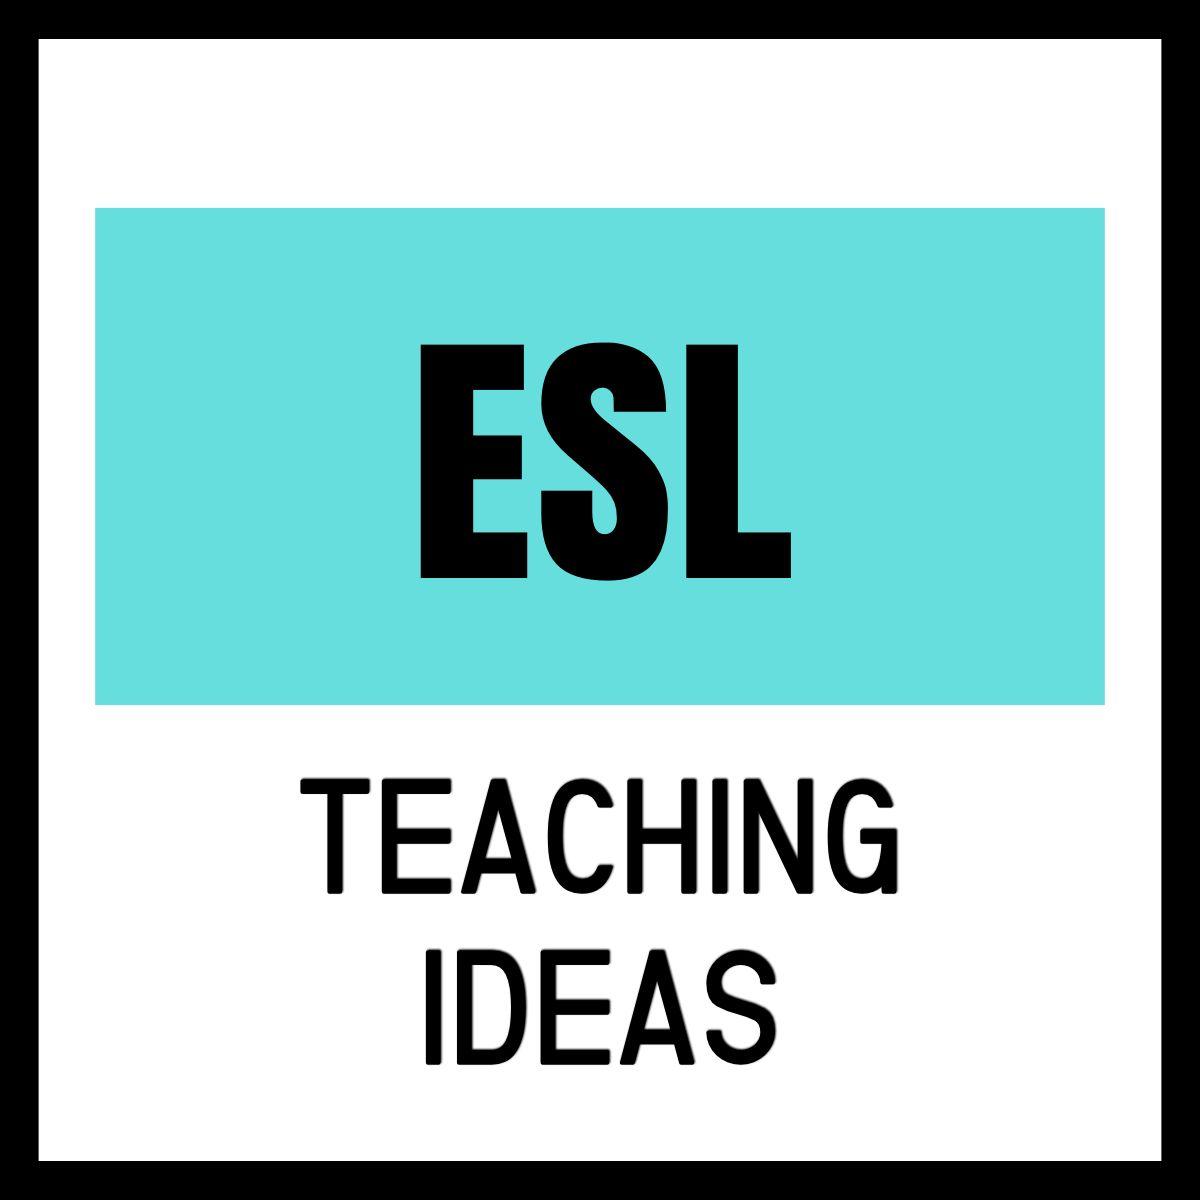 Esl Teaching Lessons Plans Printables Worksheets Games